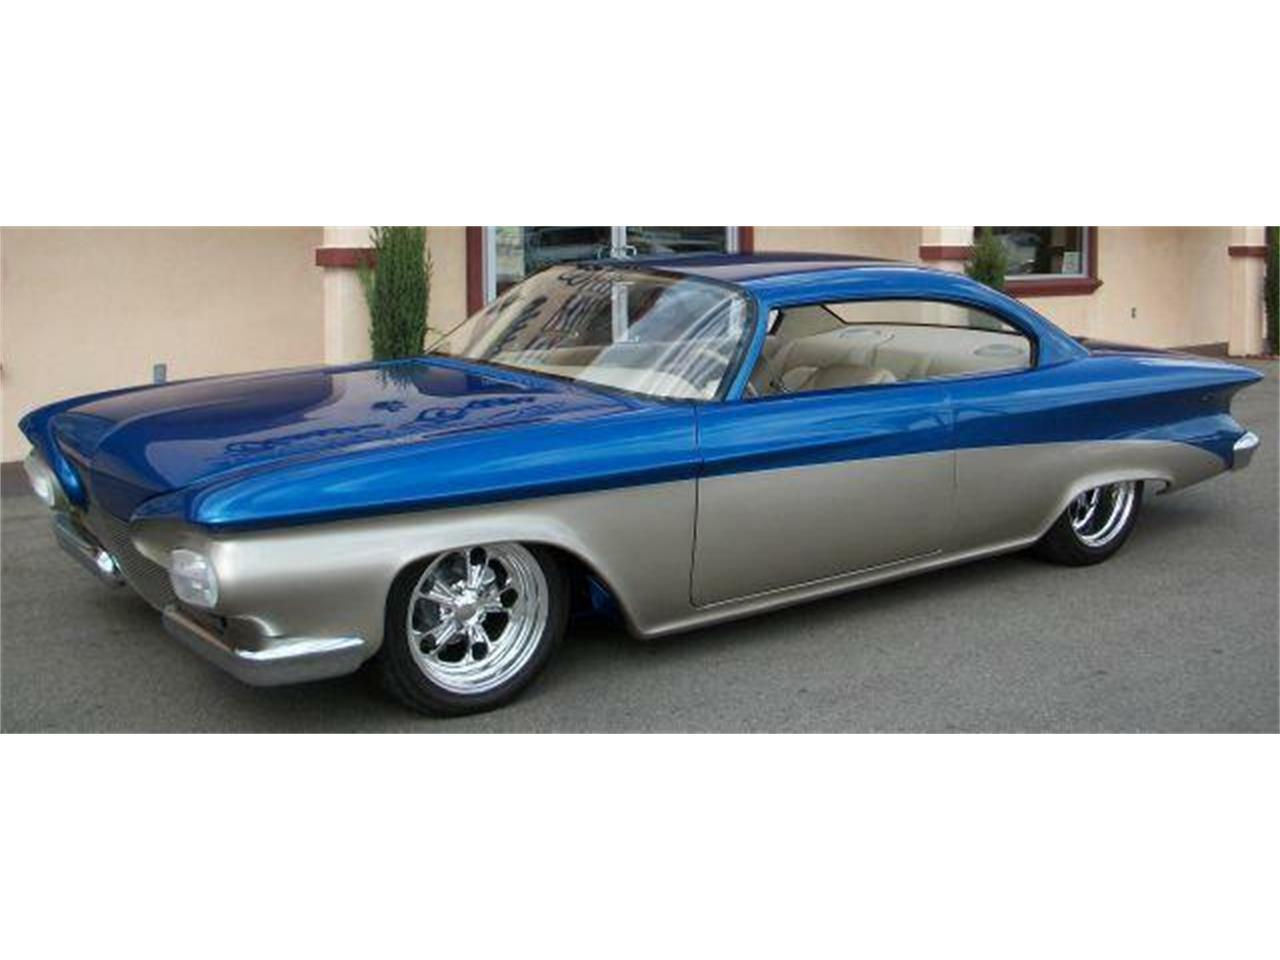 1961 Plymouth Fury (CC-366046) for sale in La Verne, California